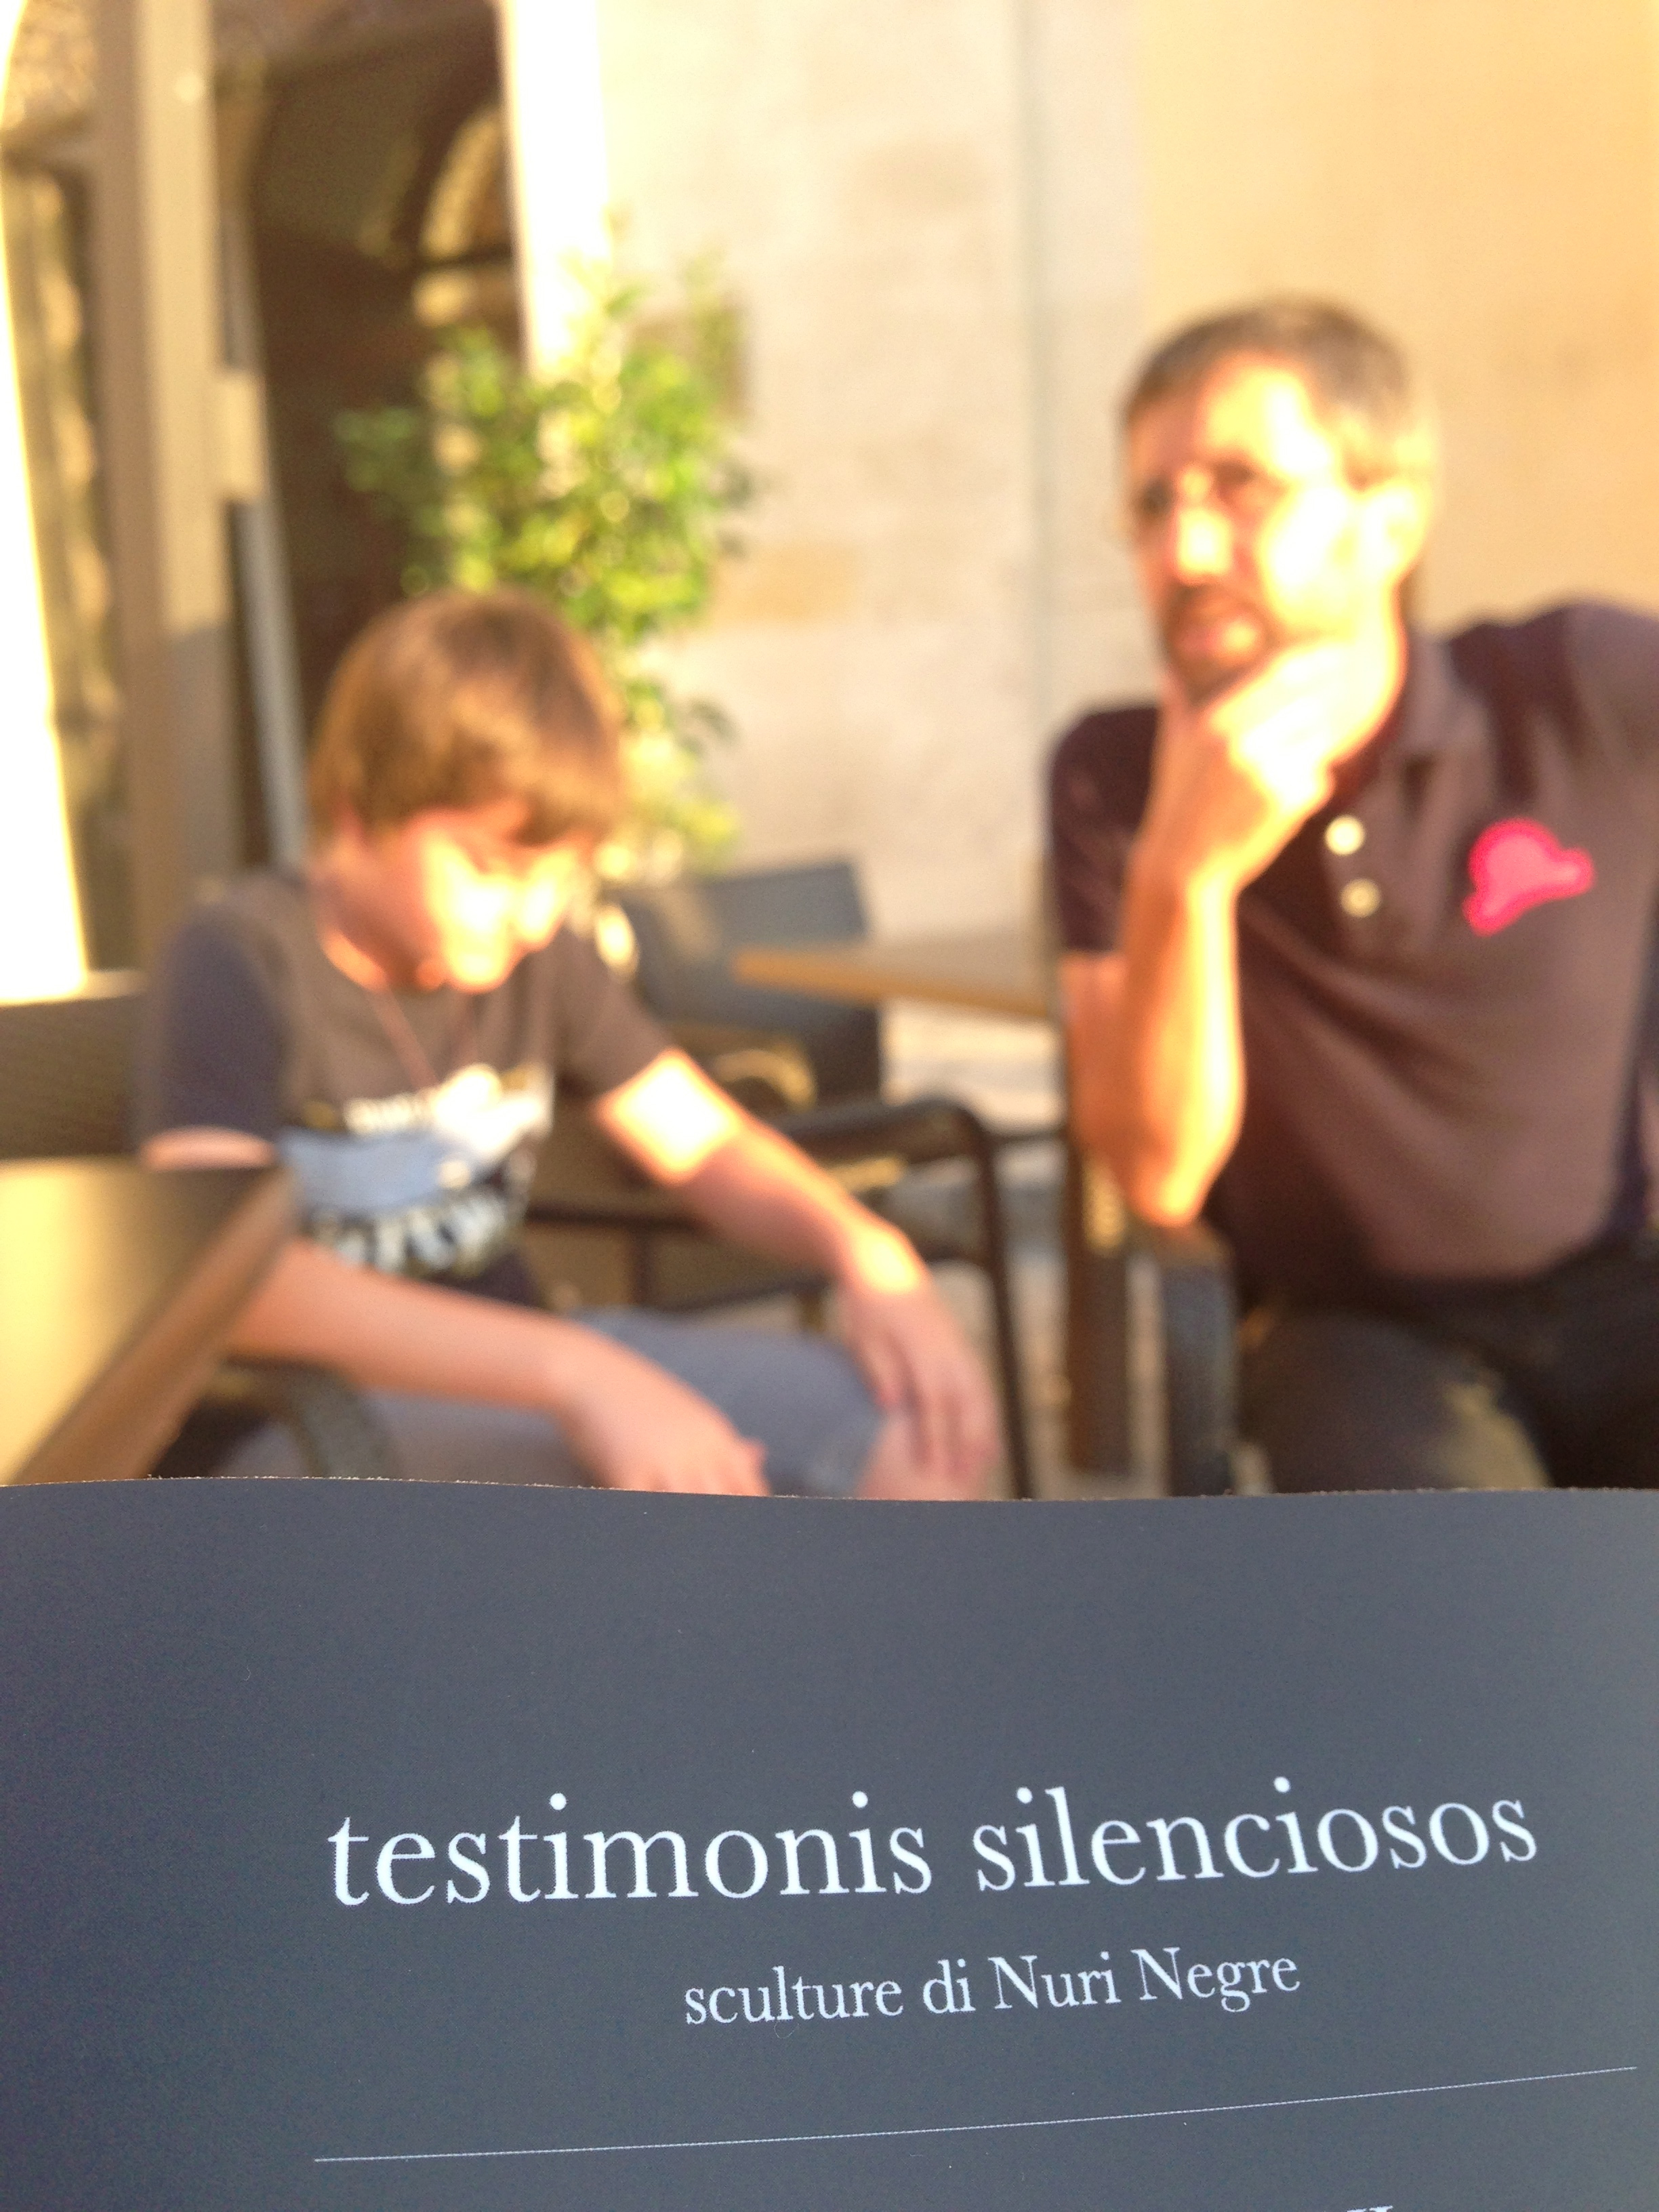 Some silent testimonies